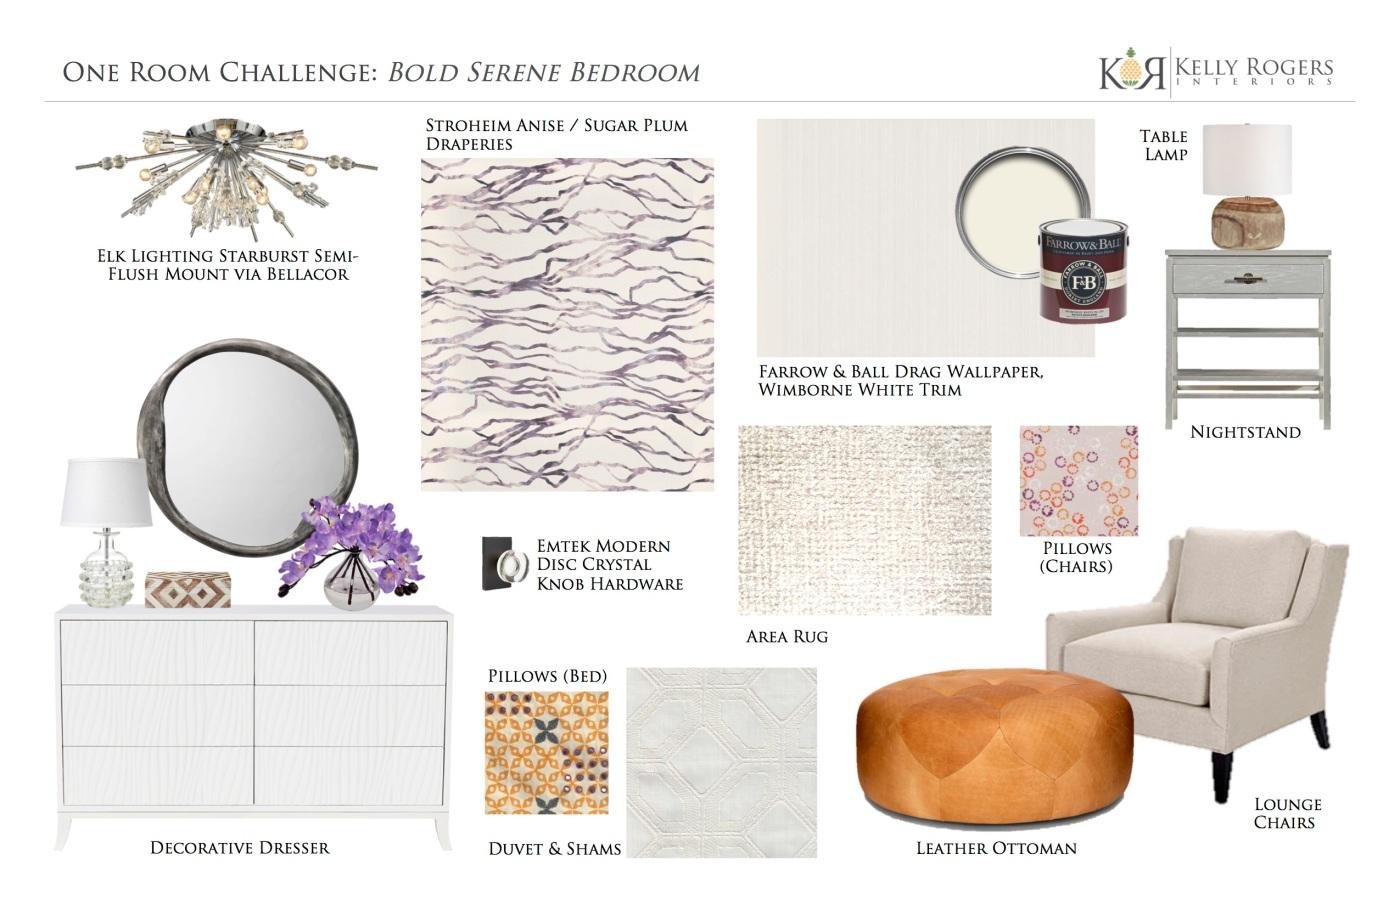 One Room Challenge Week 1: Bold Serene Bedroom